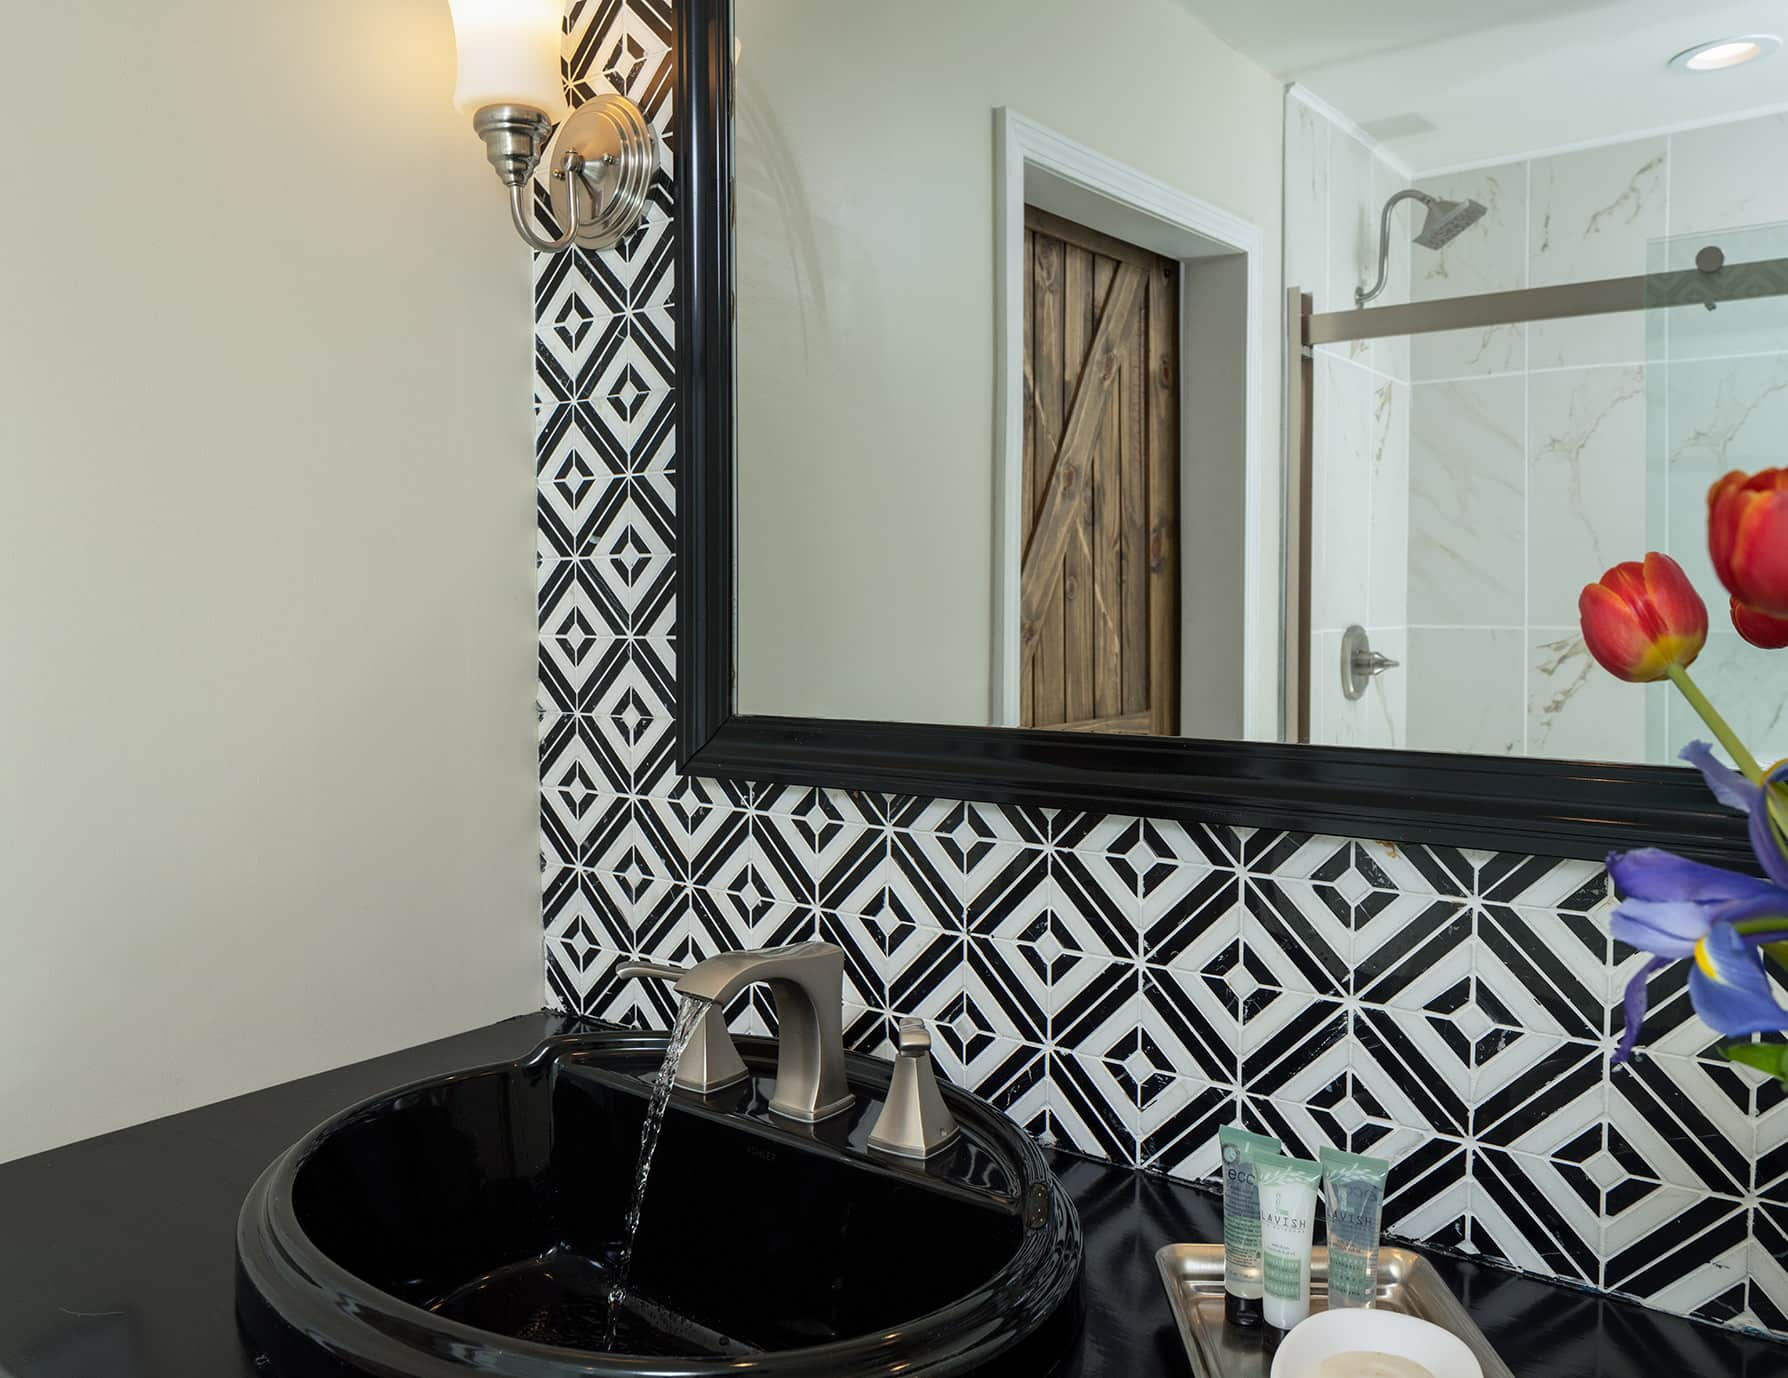 The Wellington room bathroom sink